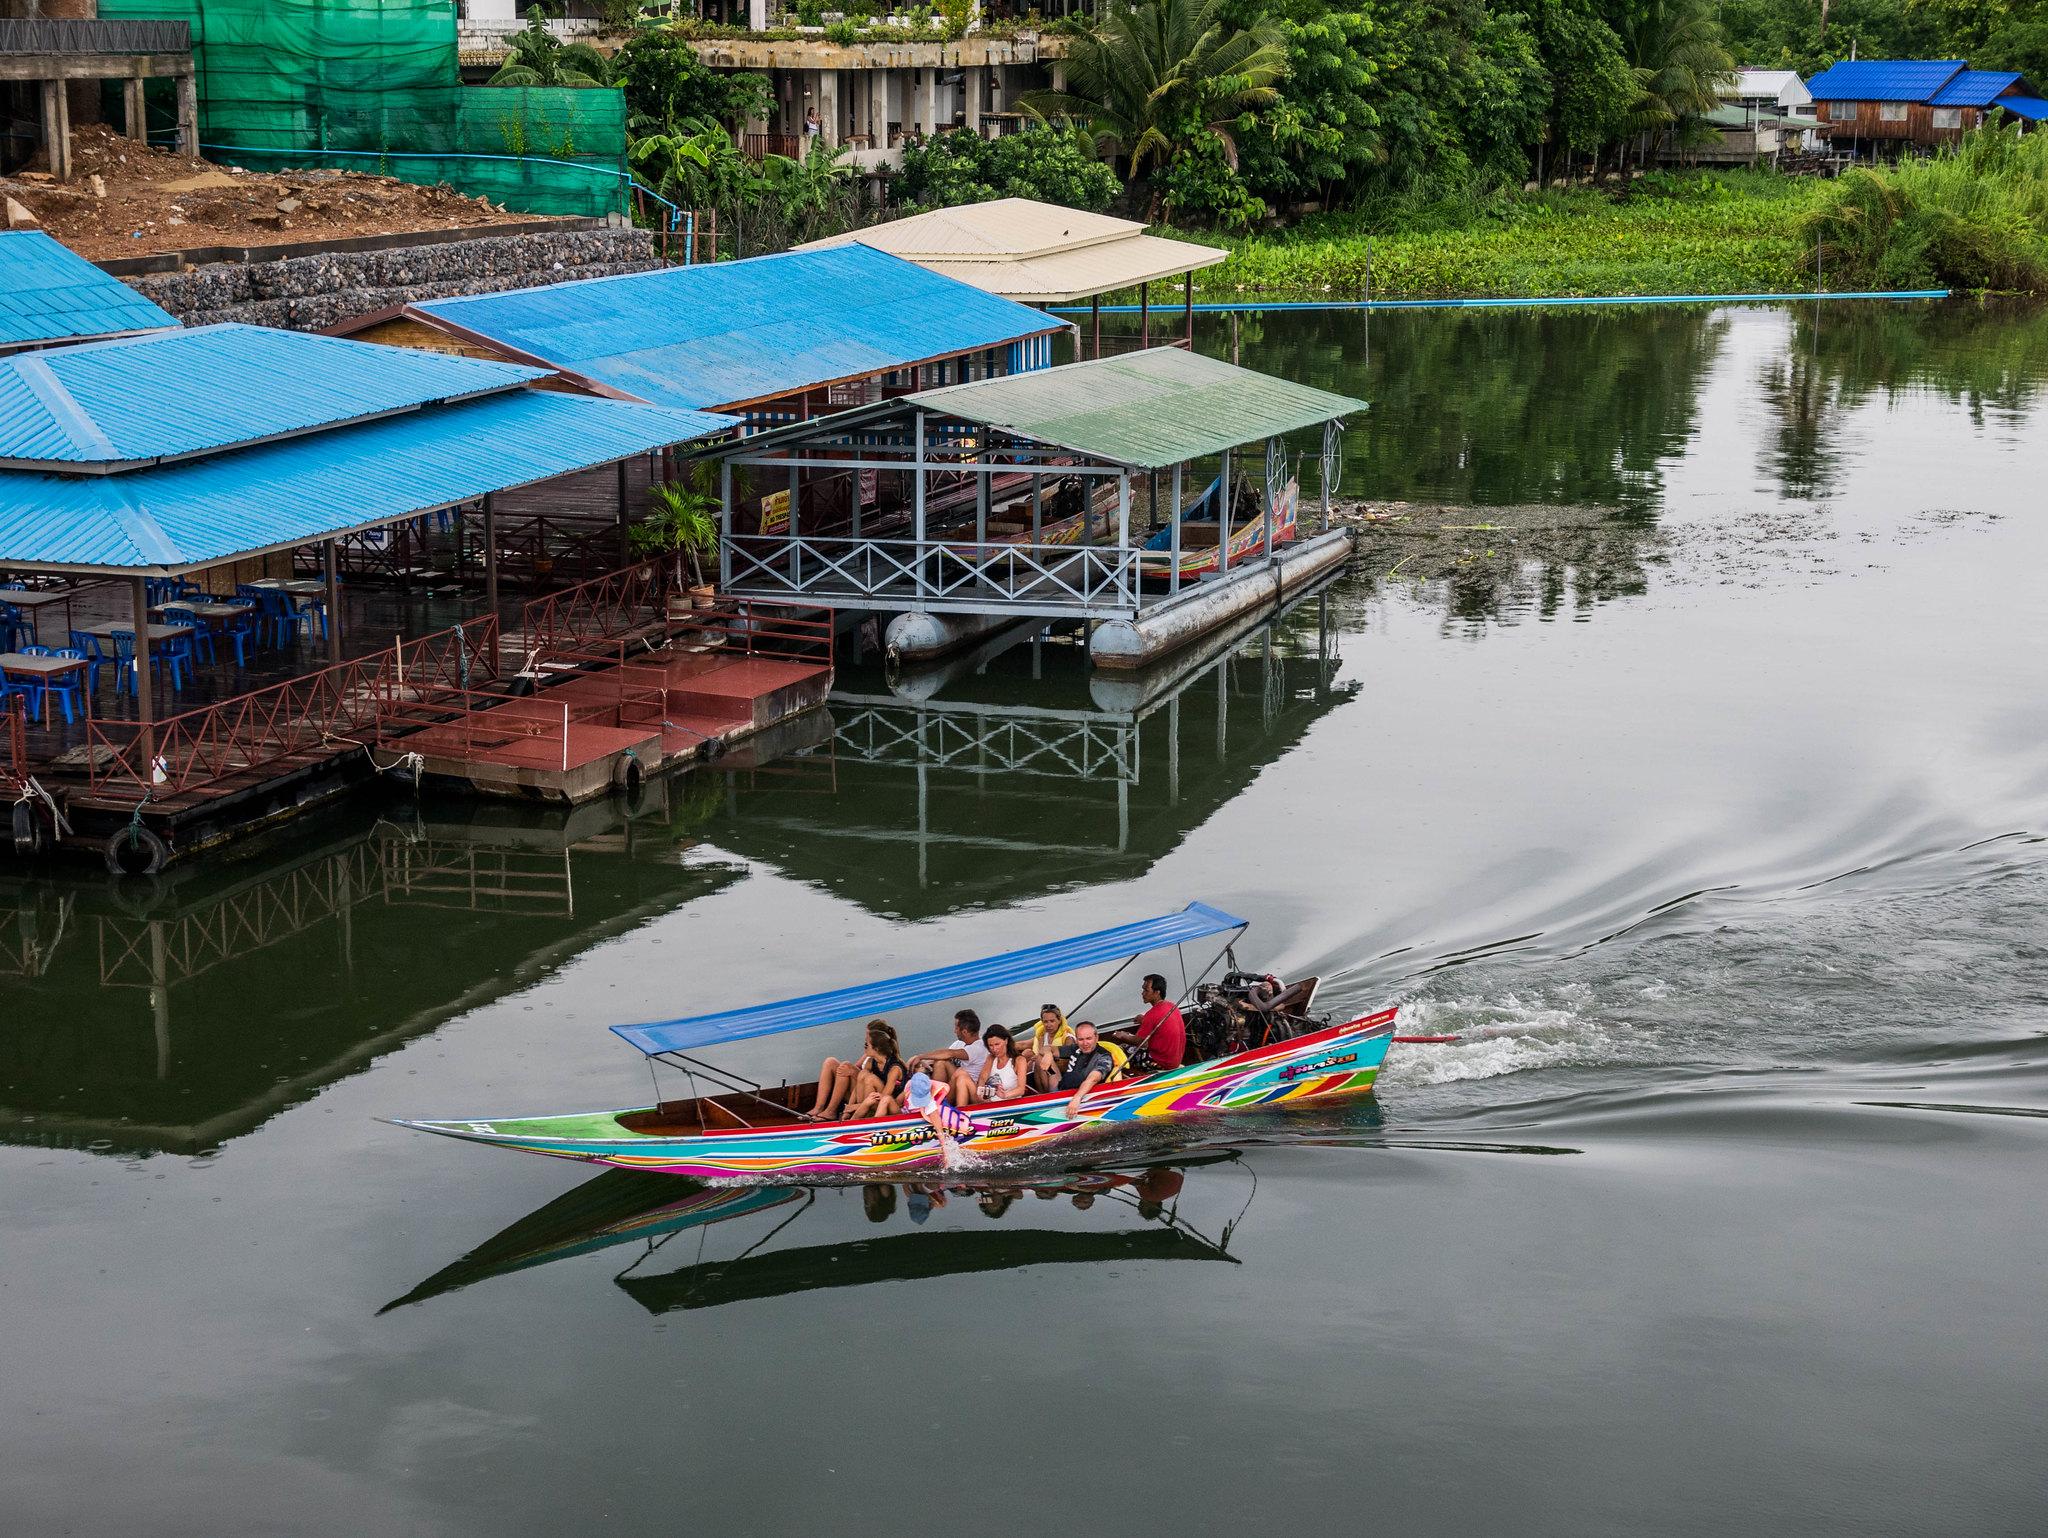 Boat on Kwaï river